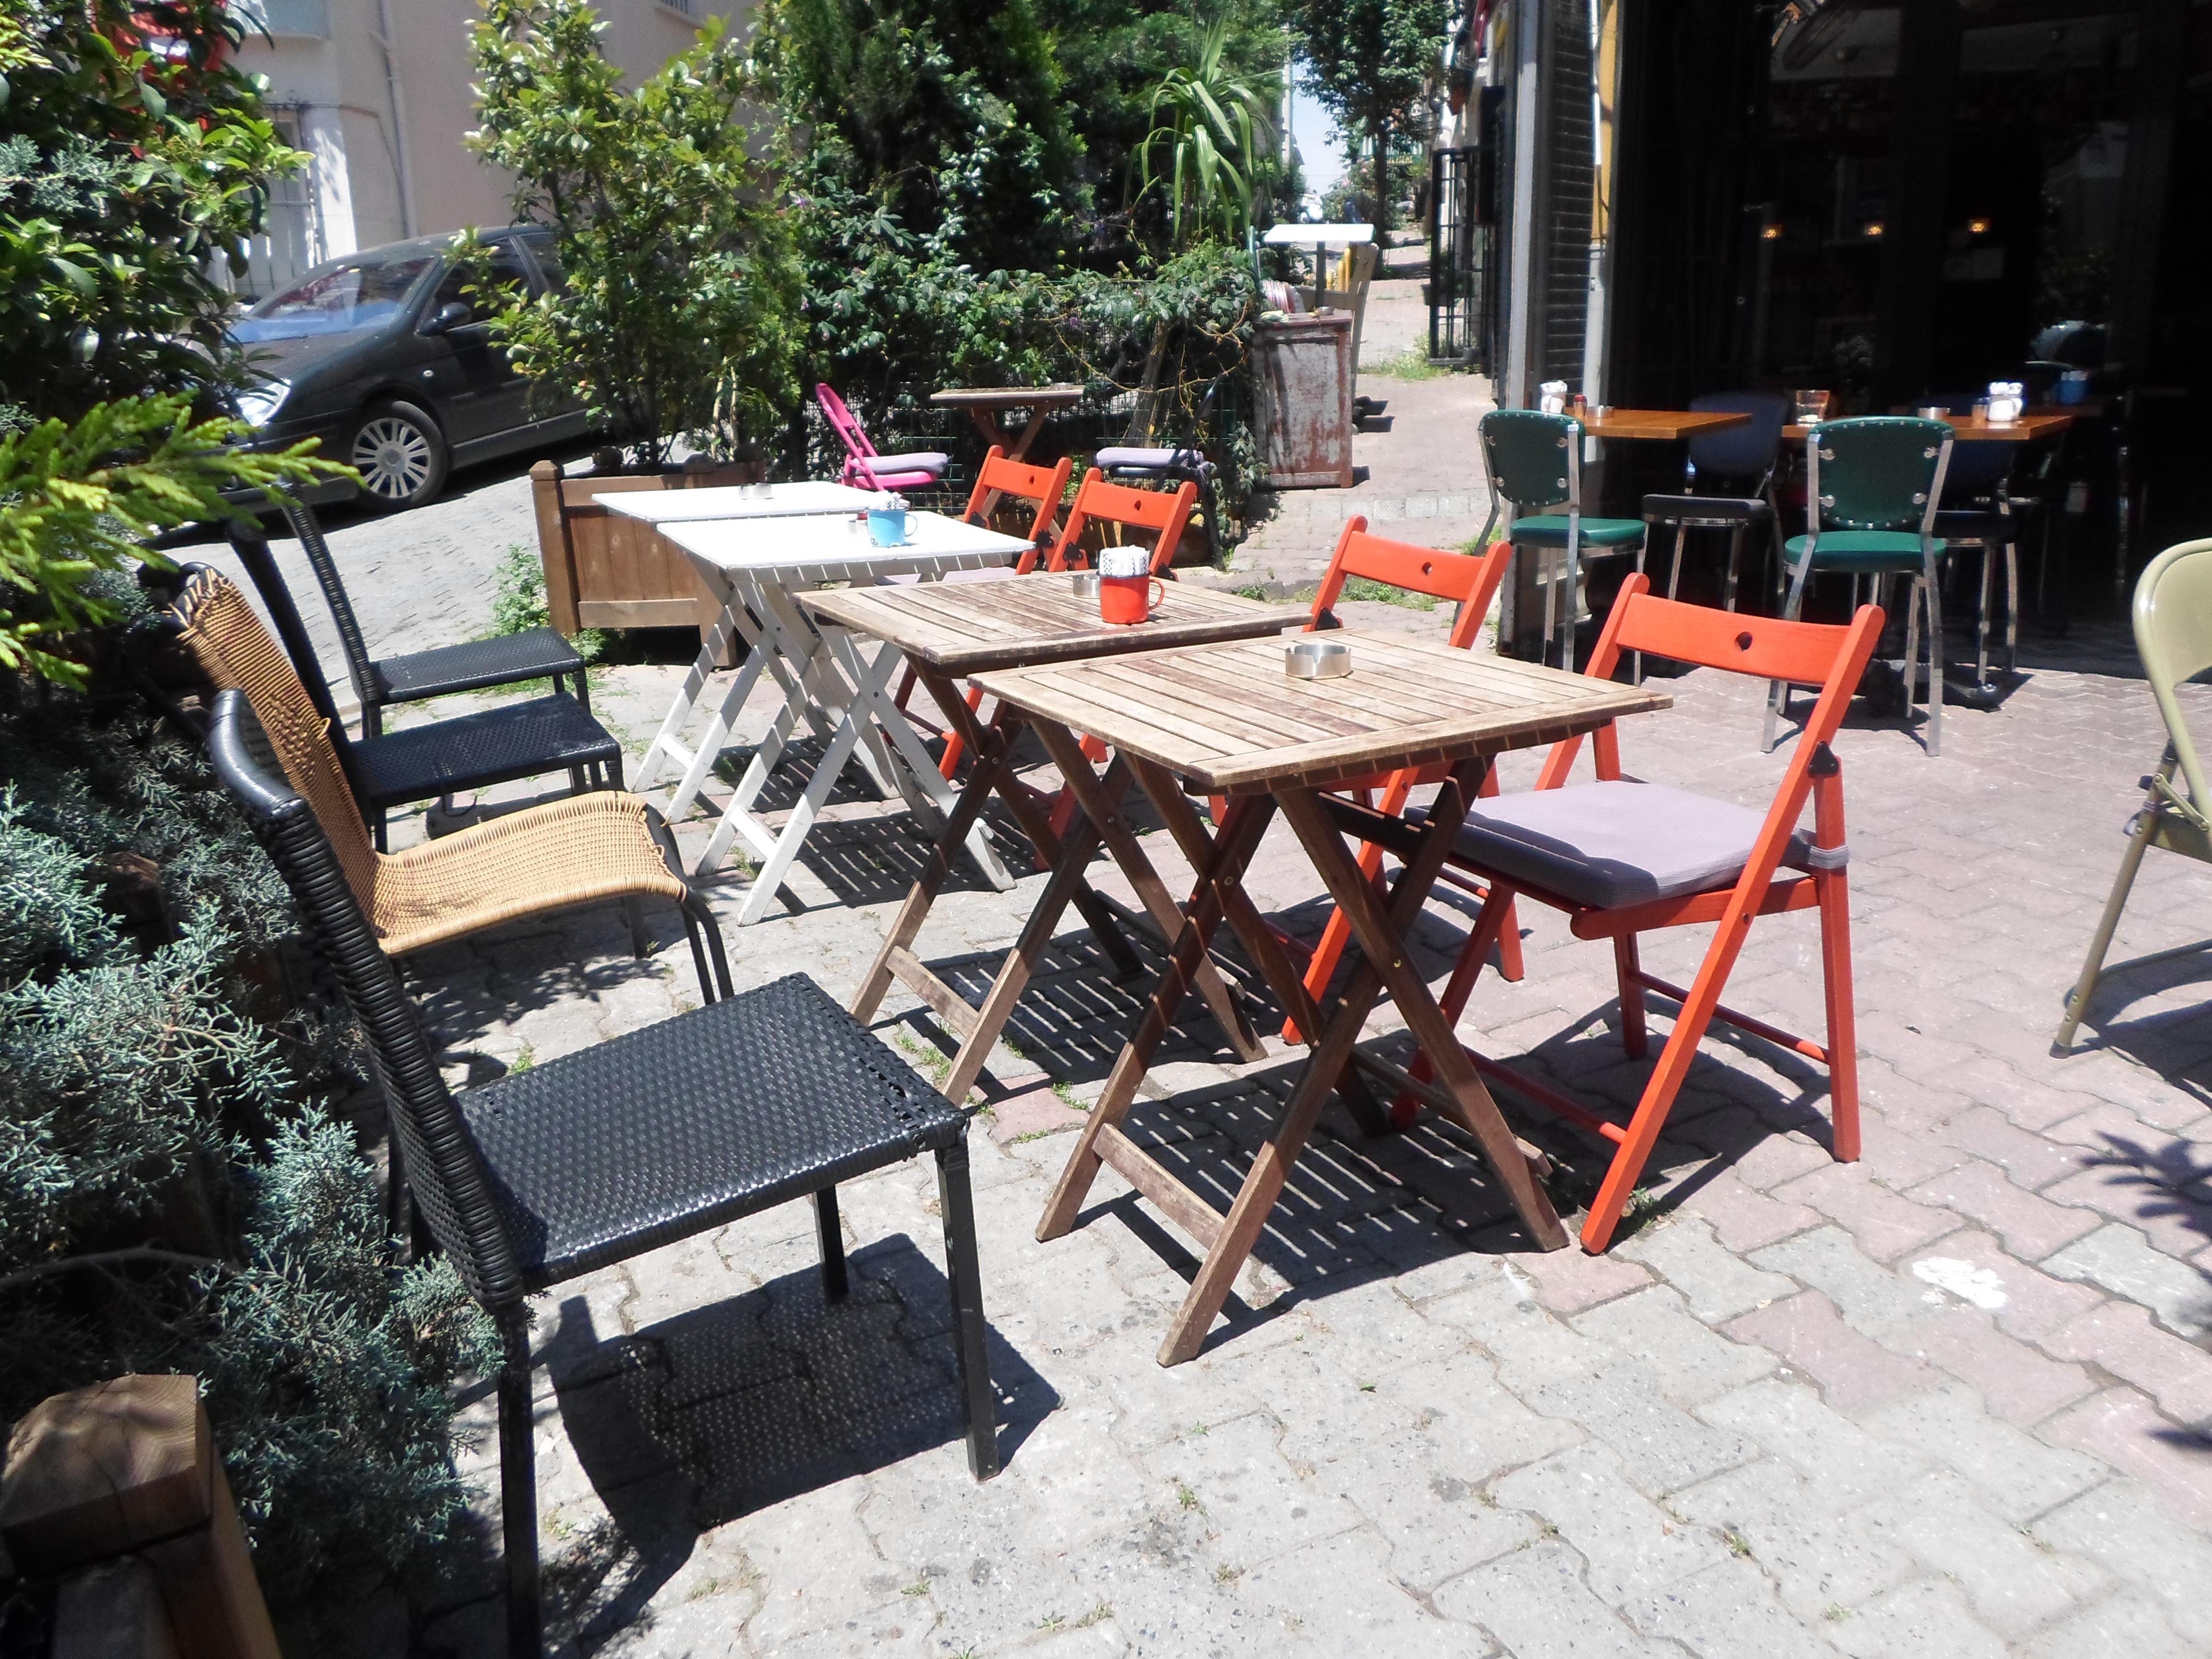 https://www.zomato.com/tr/istanbul/susam-cafe-1-cihangir-istanbul